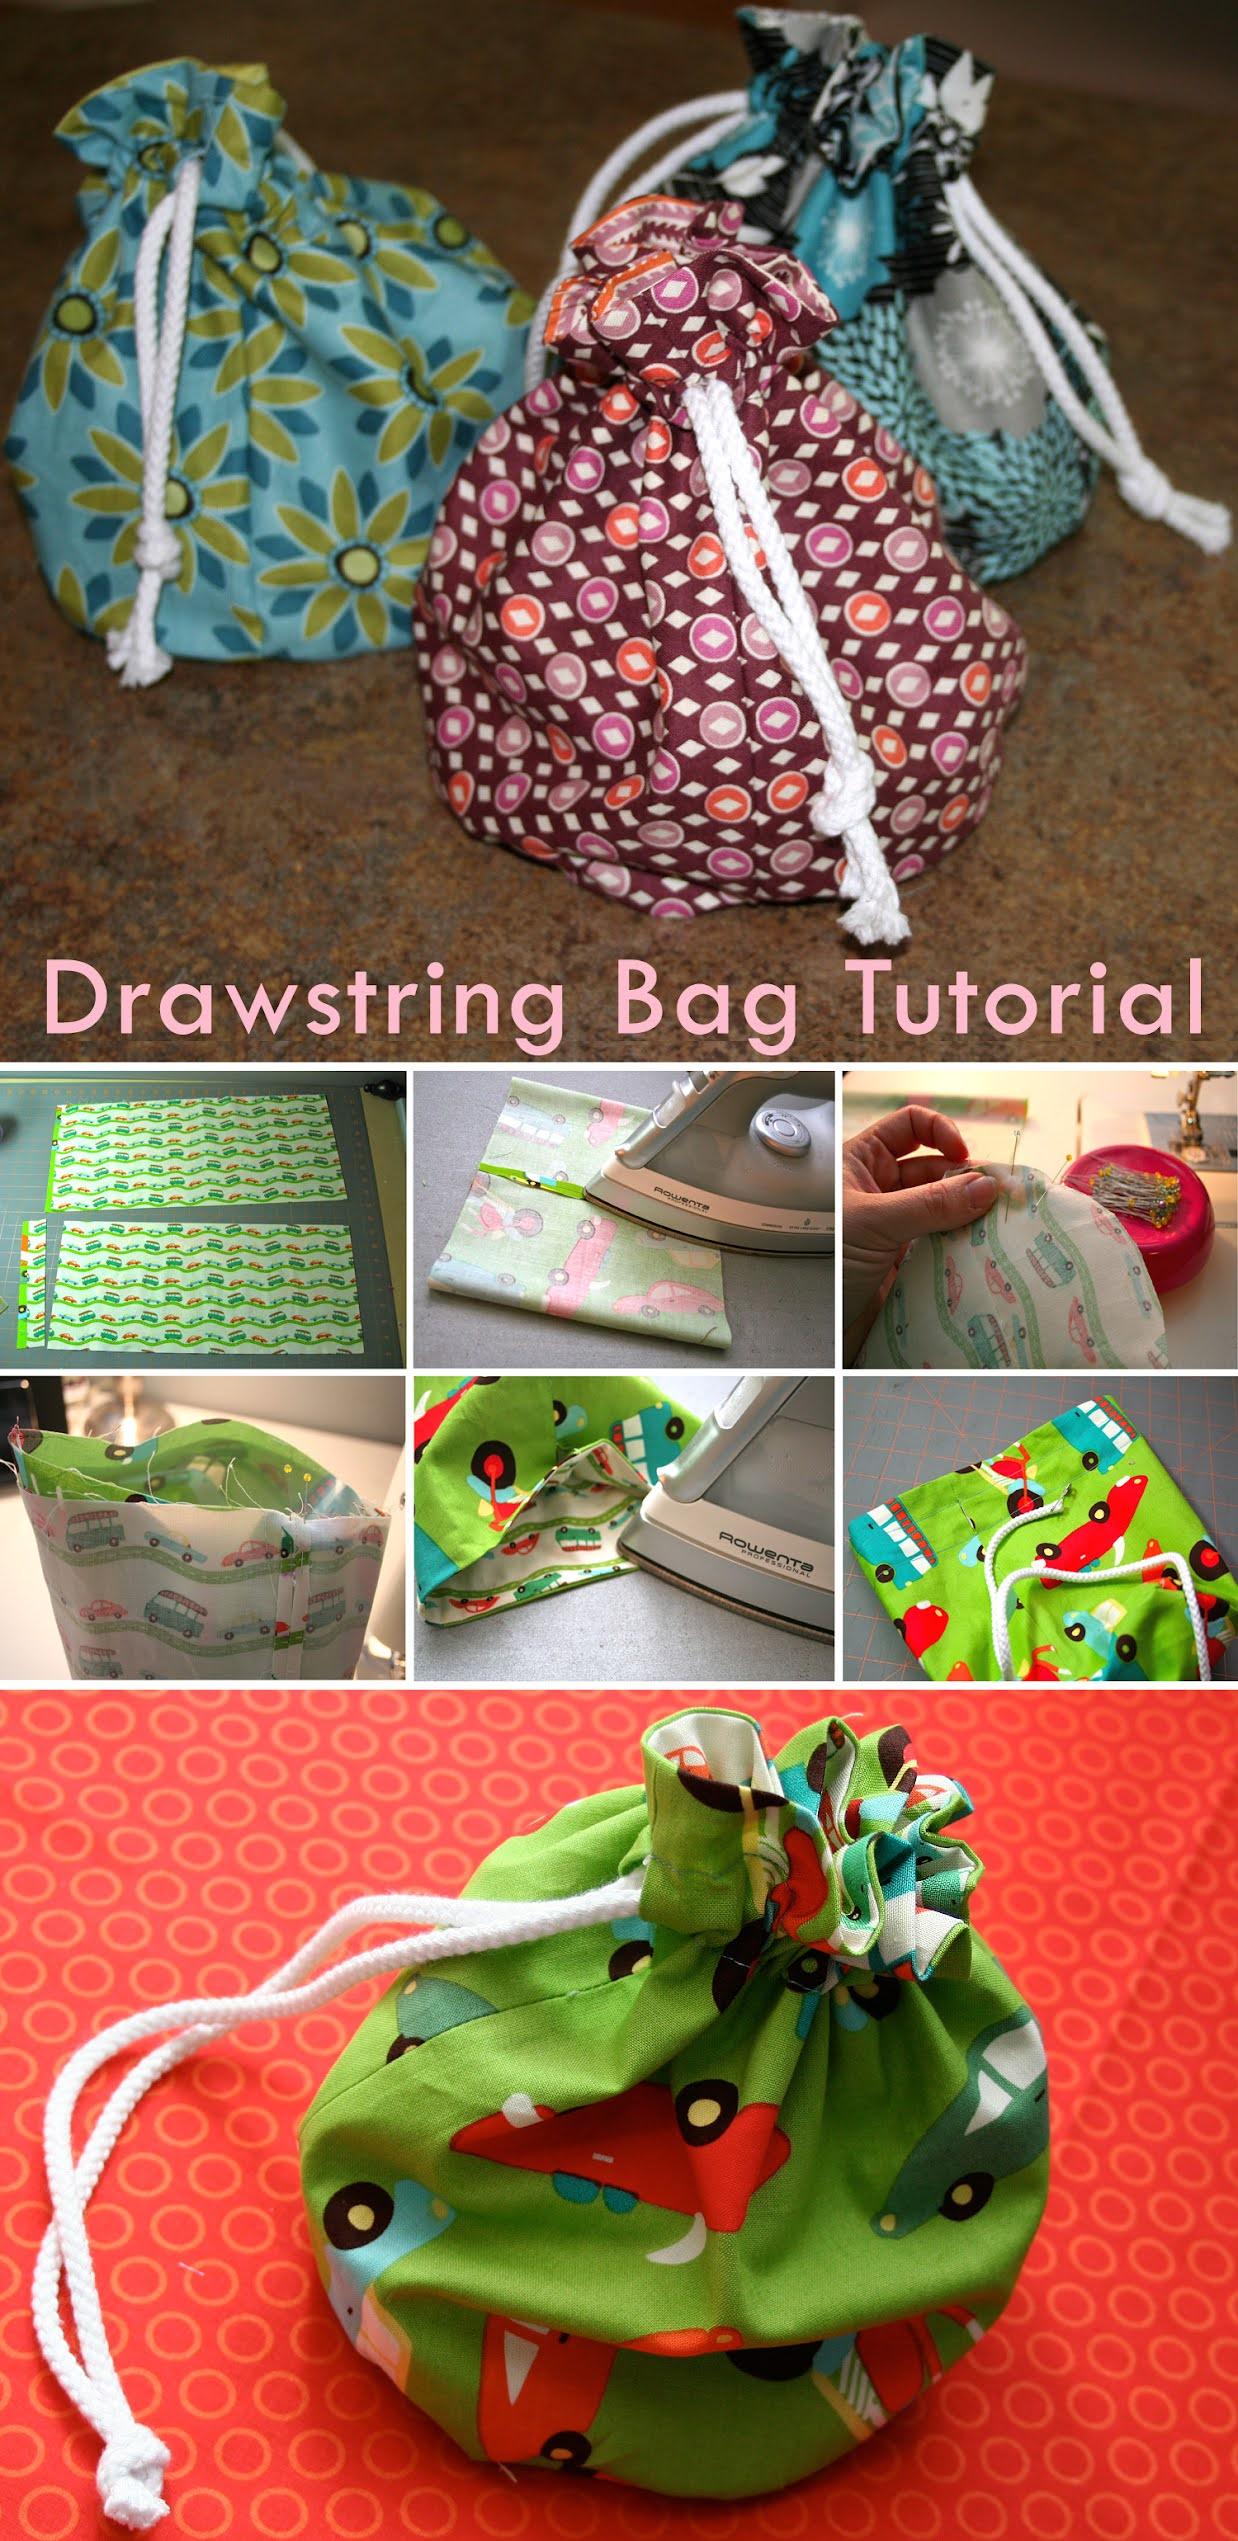 Drawstring Goodie Bags Tutorial